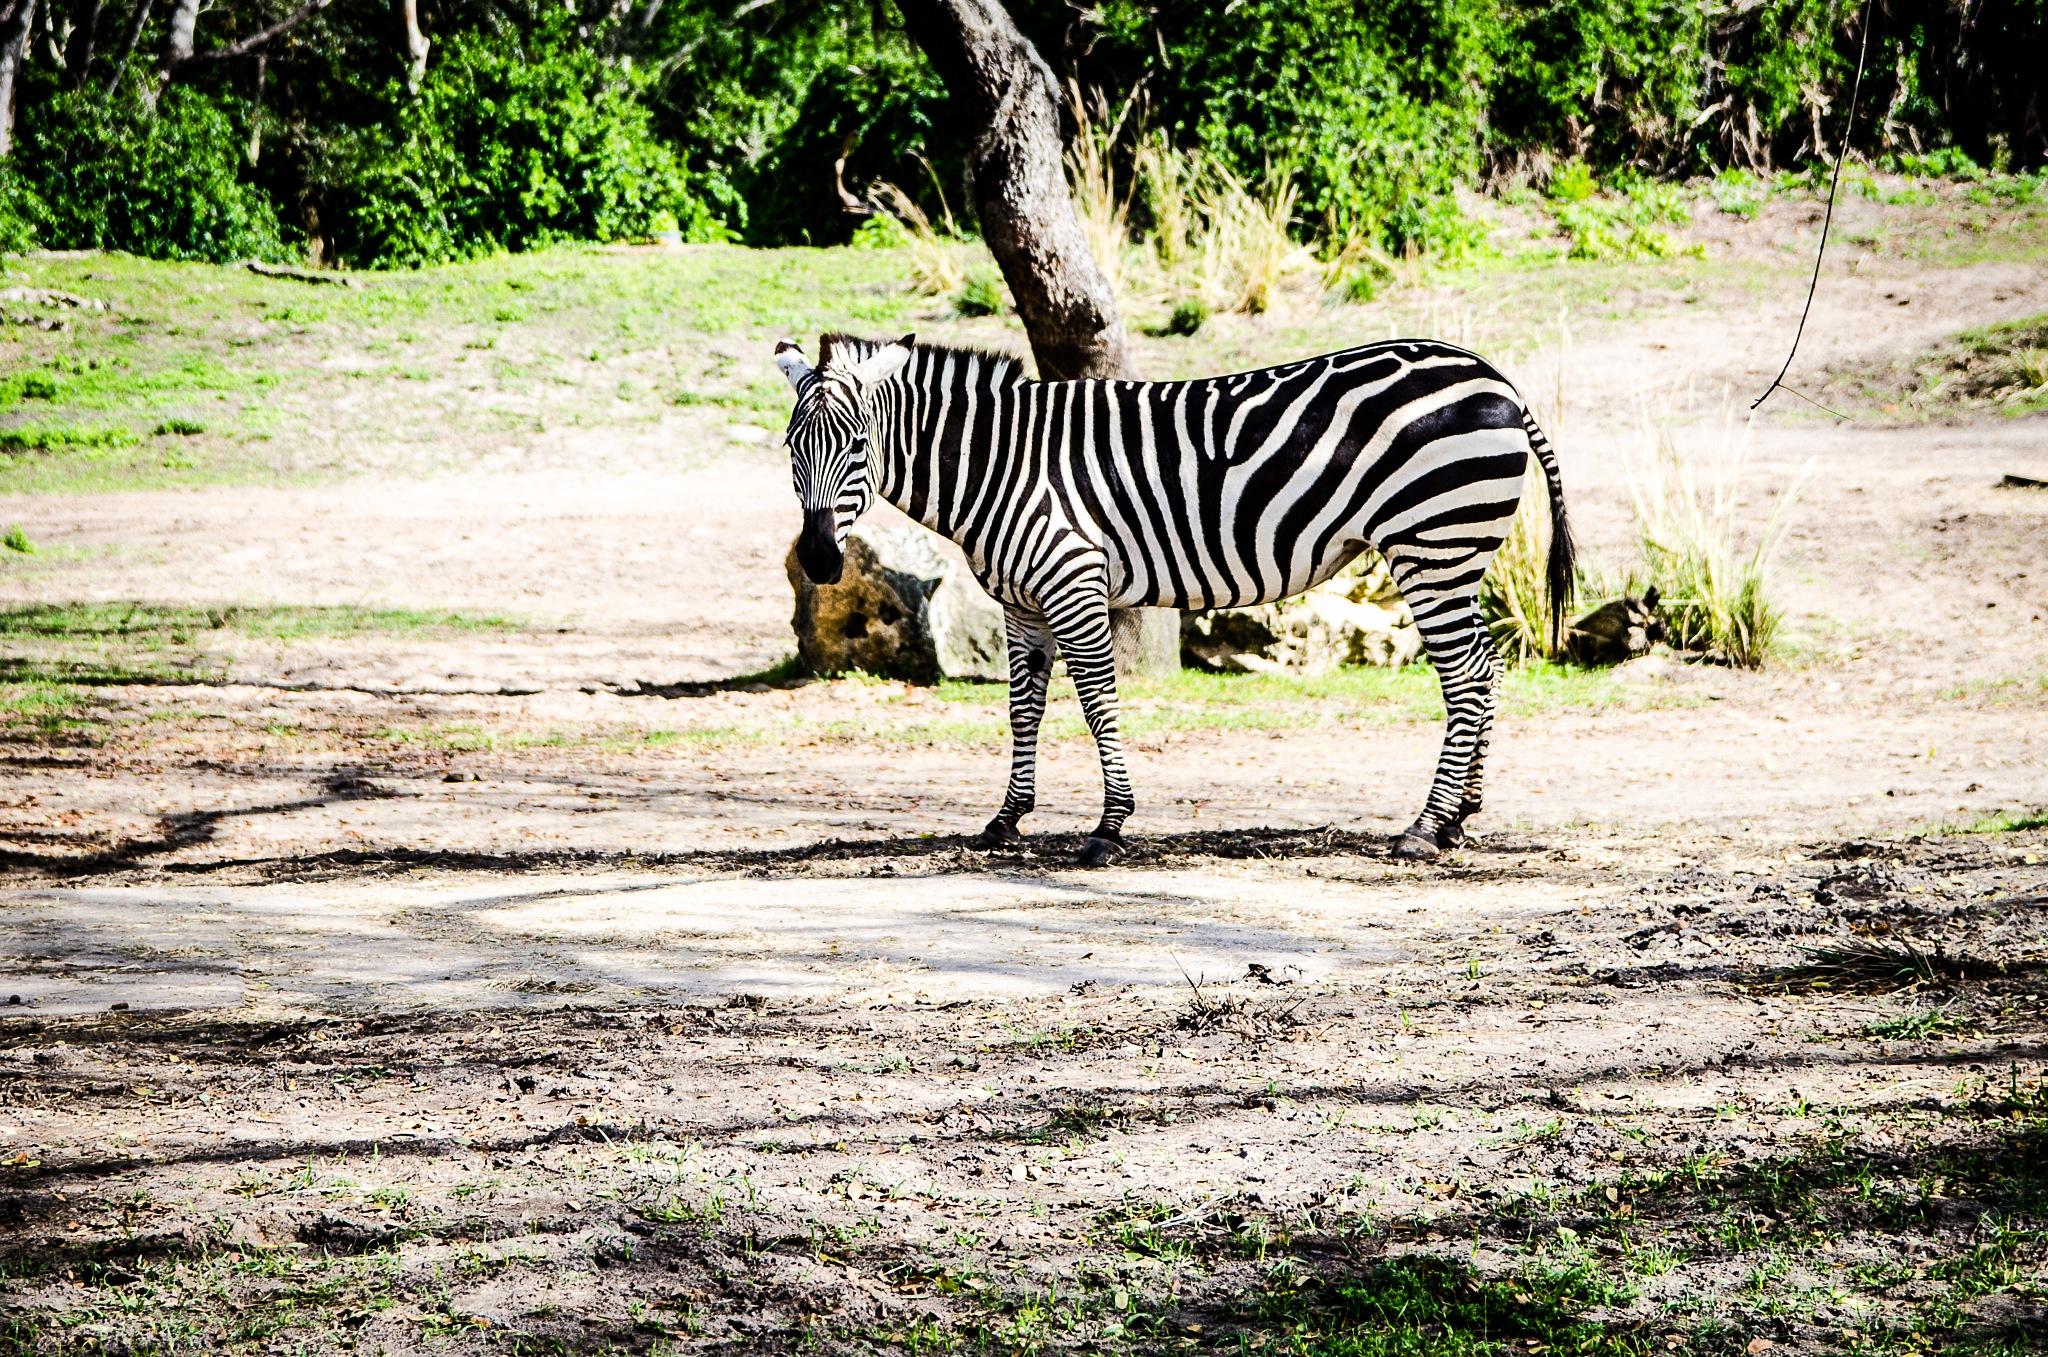 Zebra by Derek Pogue